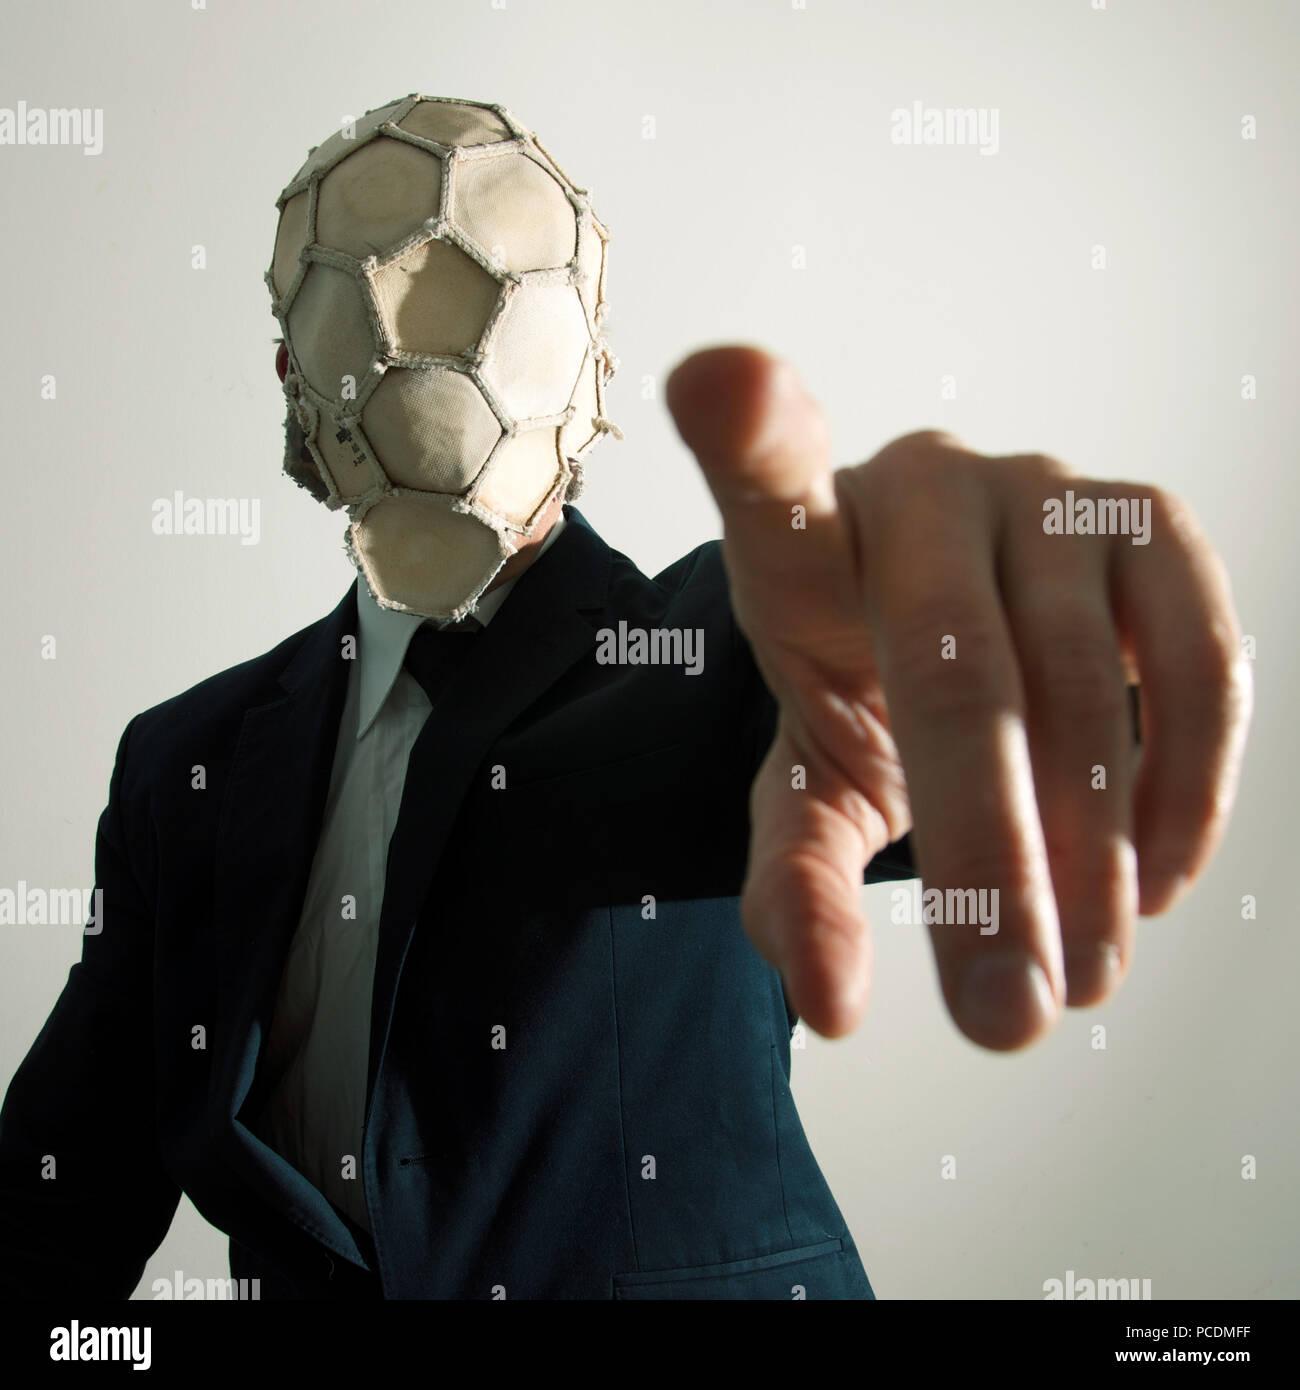 man,soccer,mask,clue - Stock Image